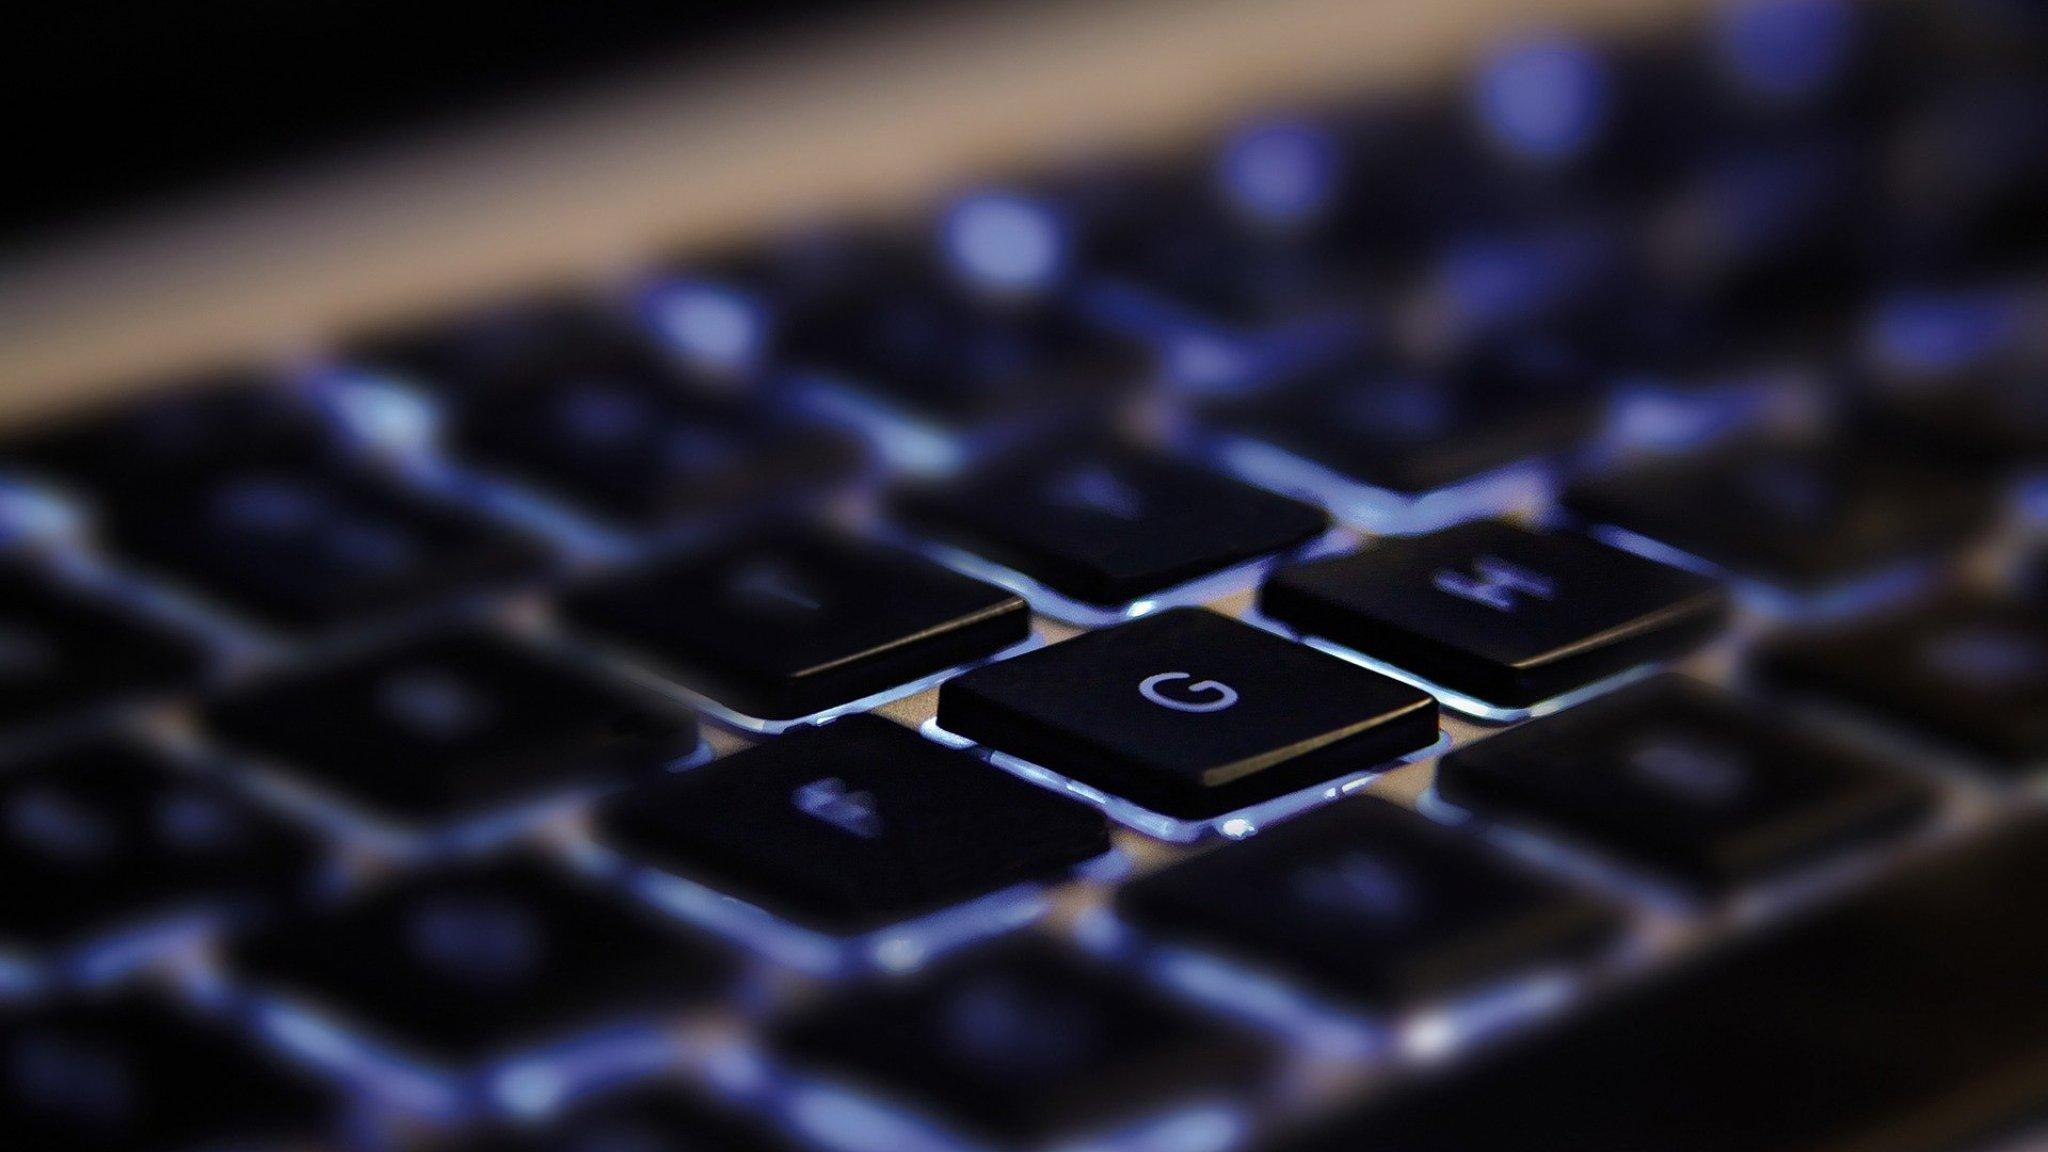 Cyberaanval op UvA en Hogeschool van Amsterdam - RTL Nieuws